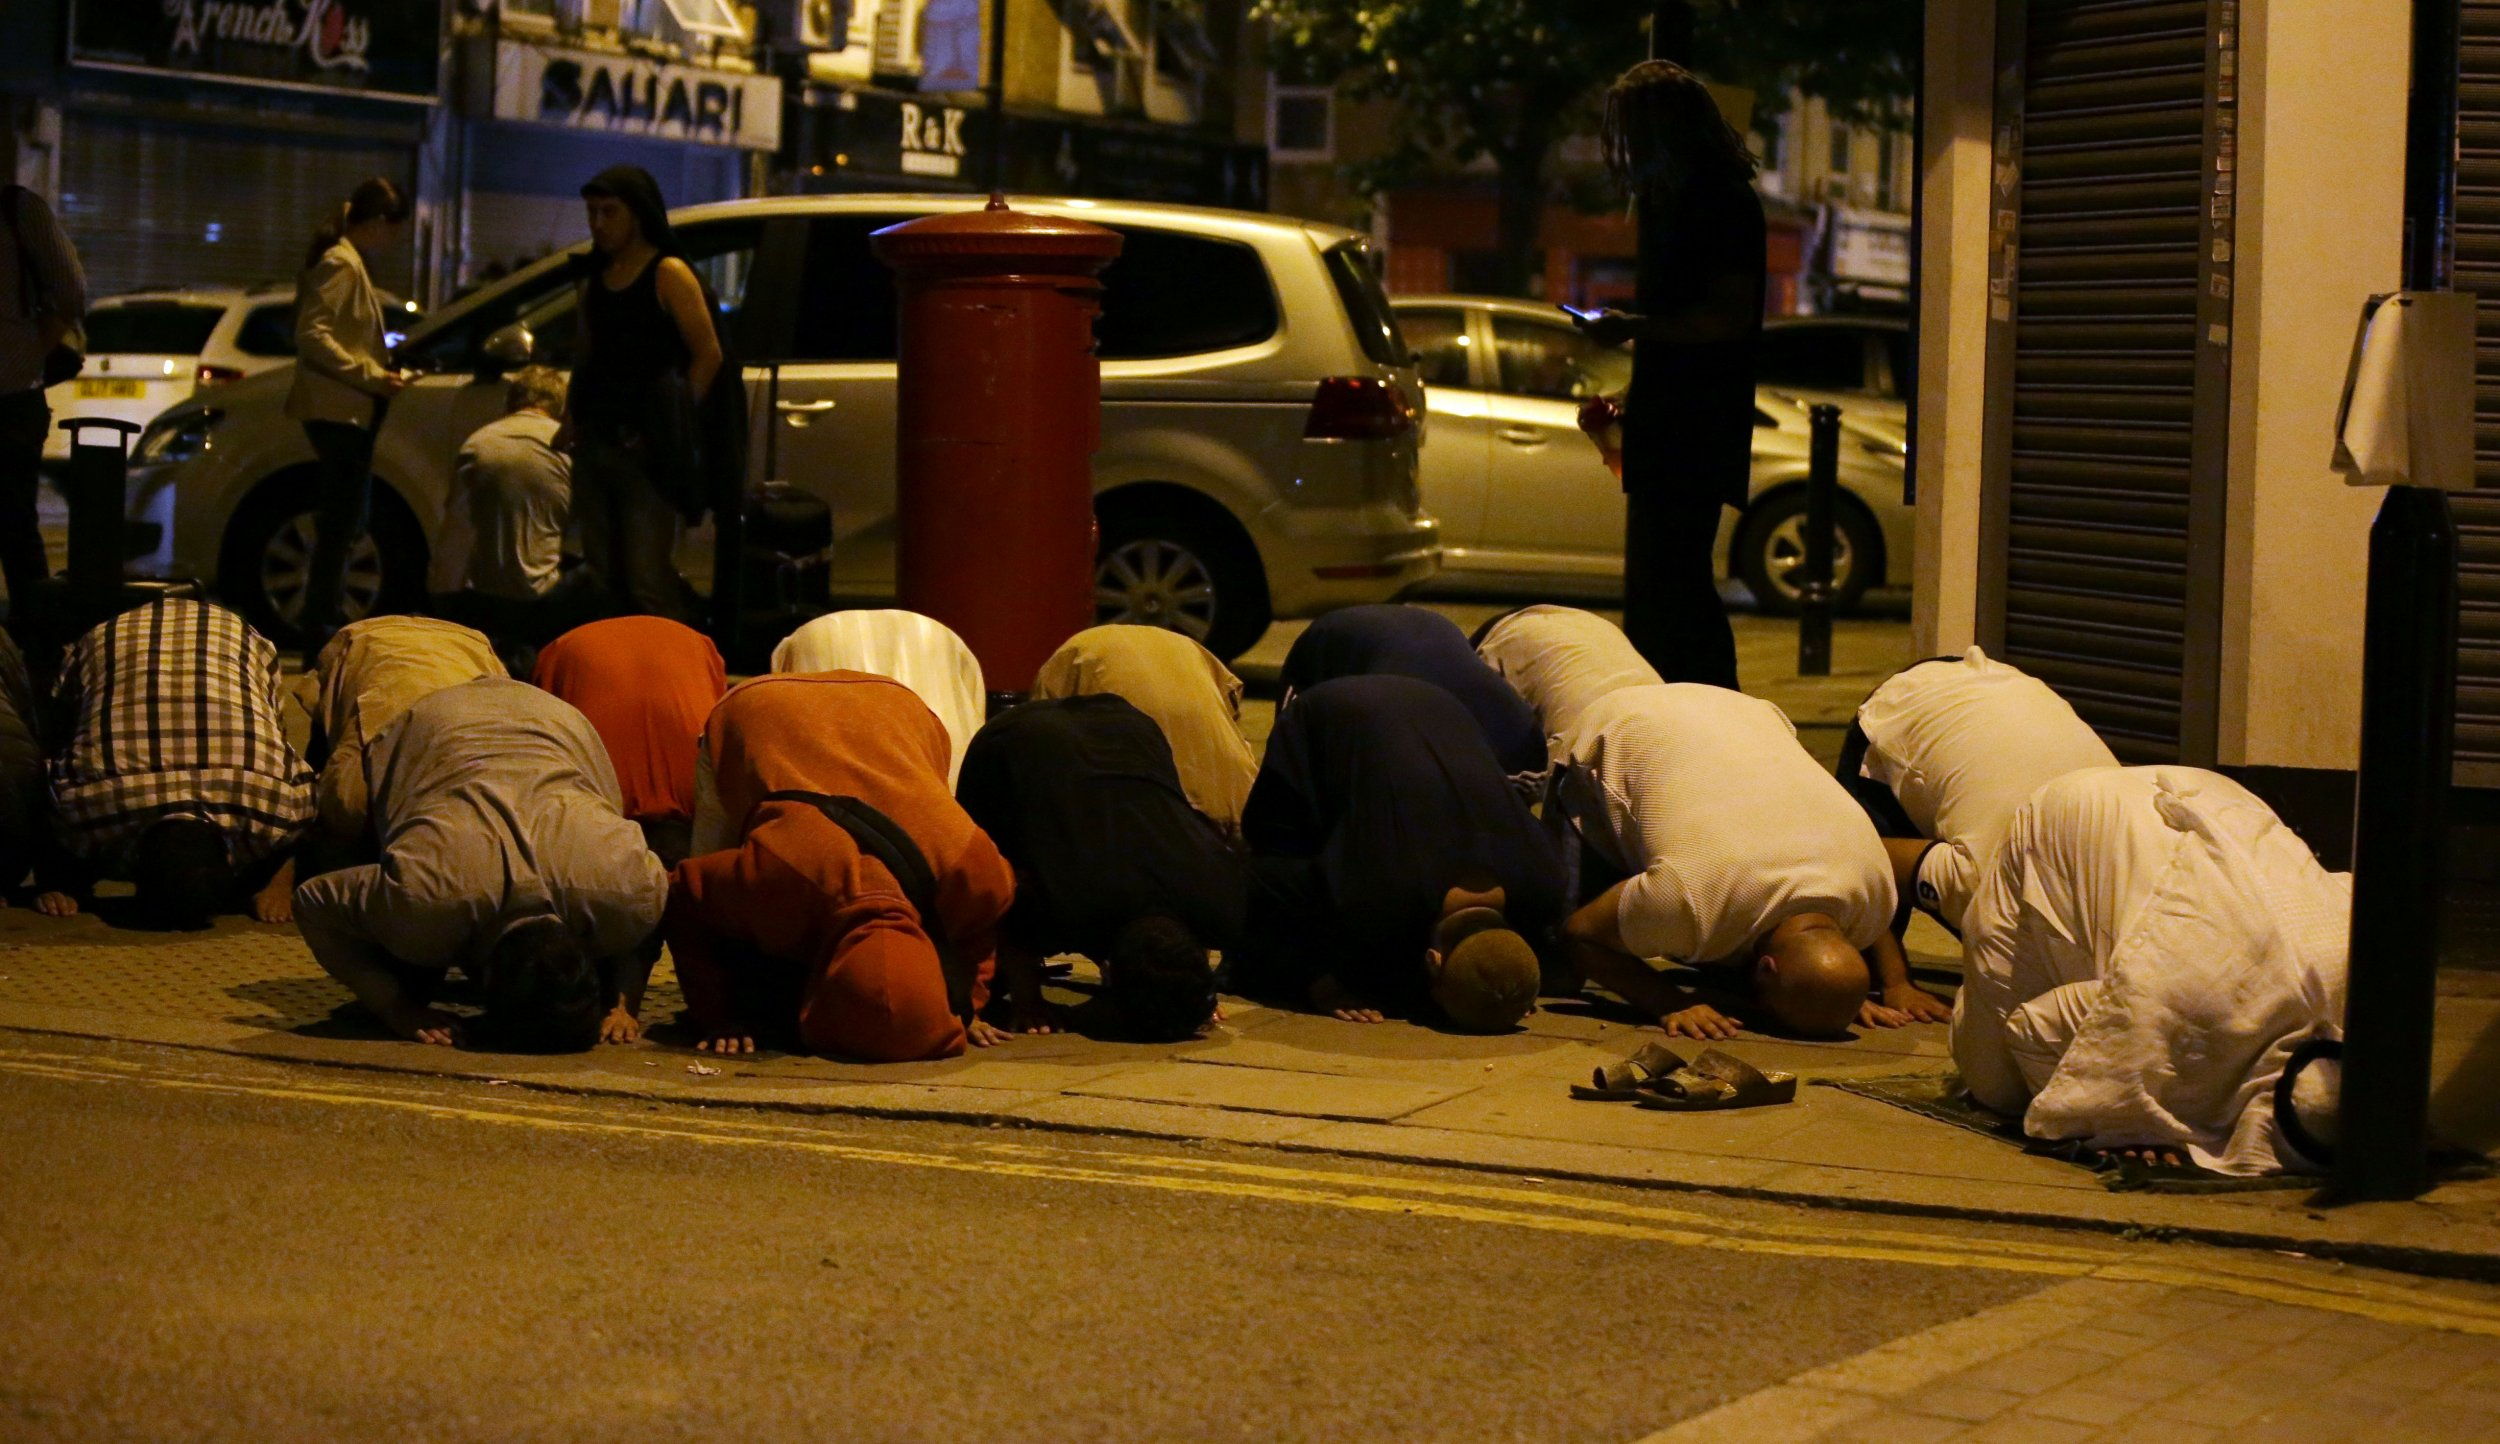 Muslim worshippers North London